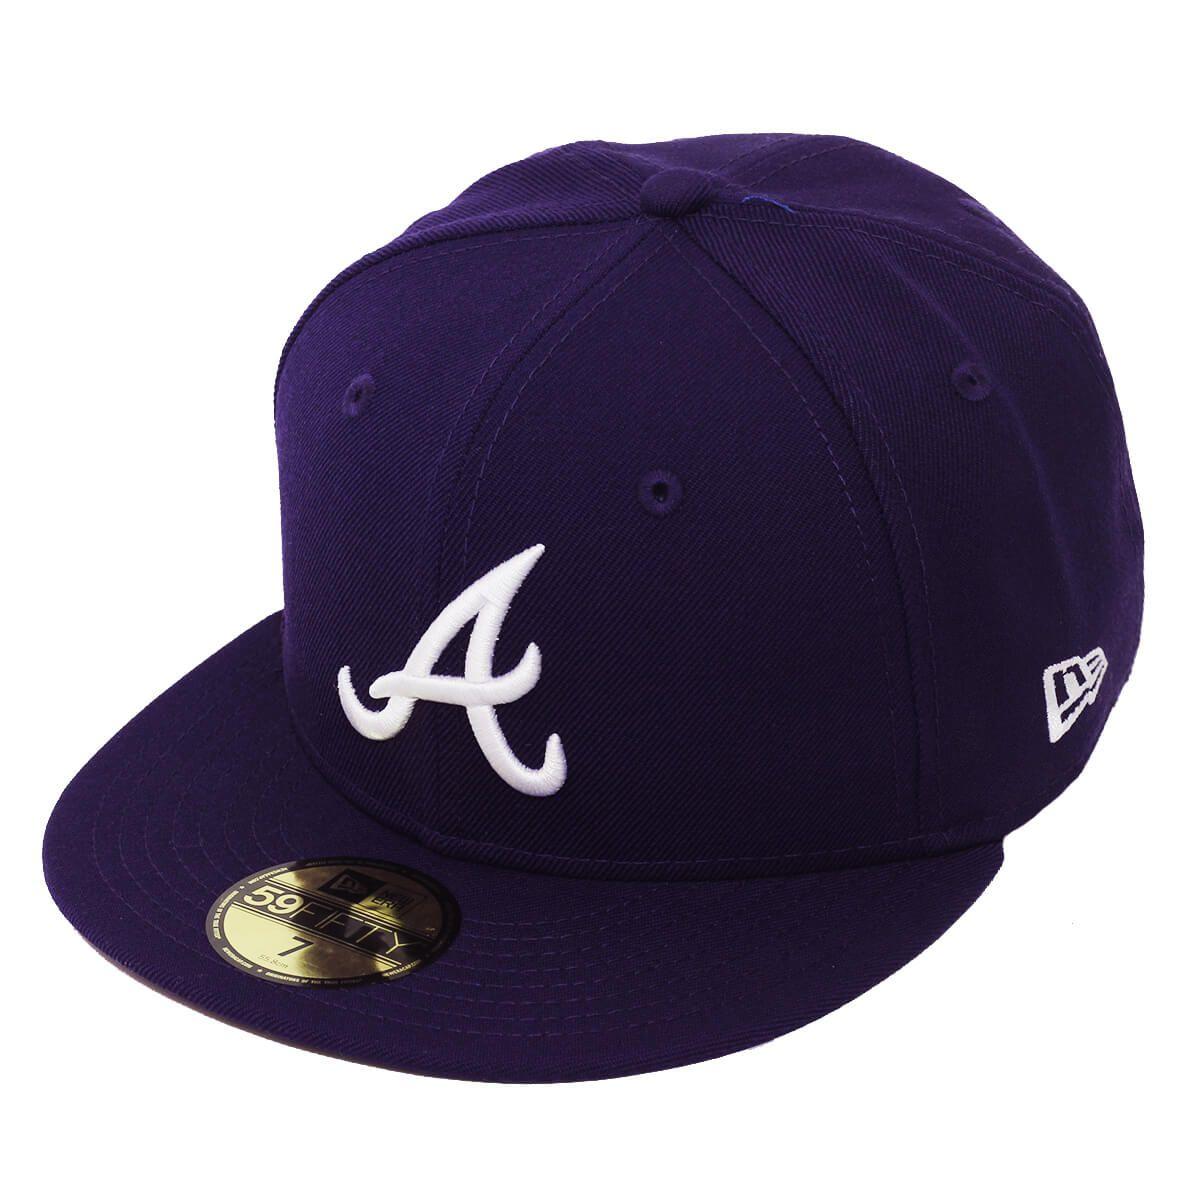 Boné New Era Aba Reta 5950 MLB Atlanta Basic Colors Roxo